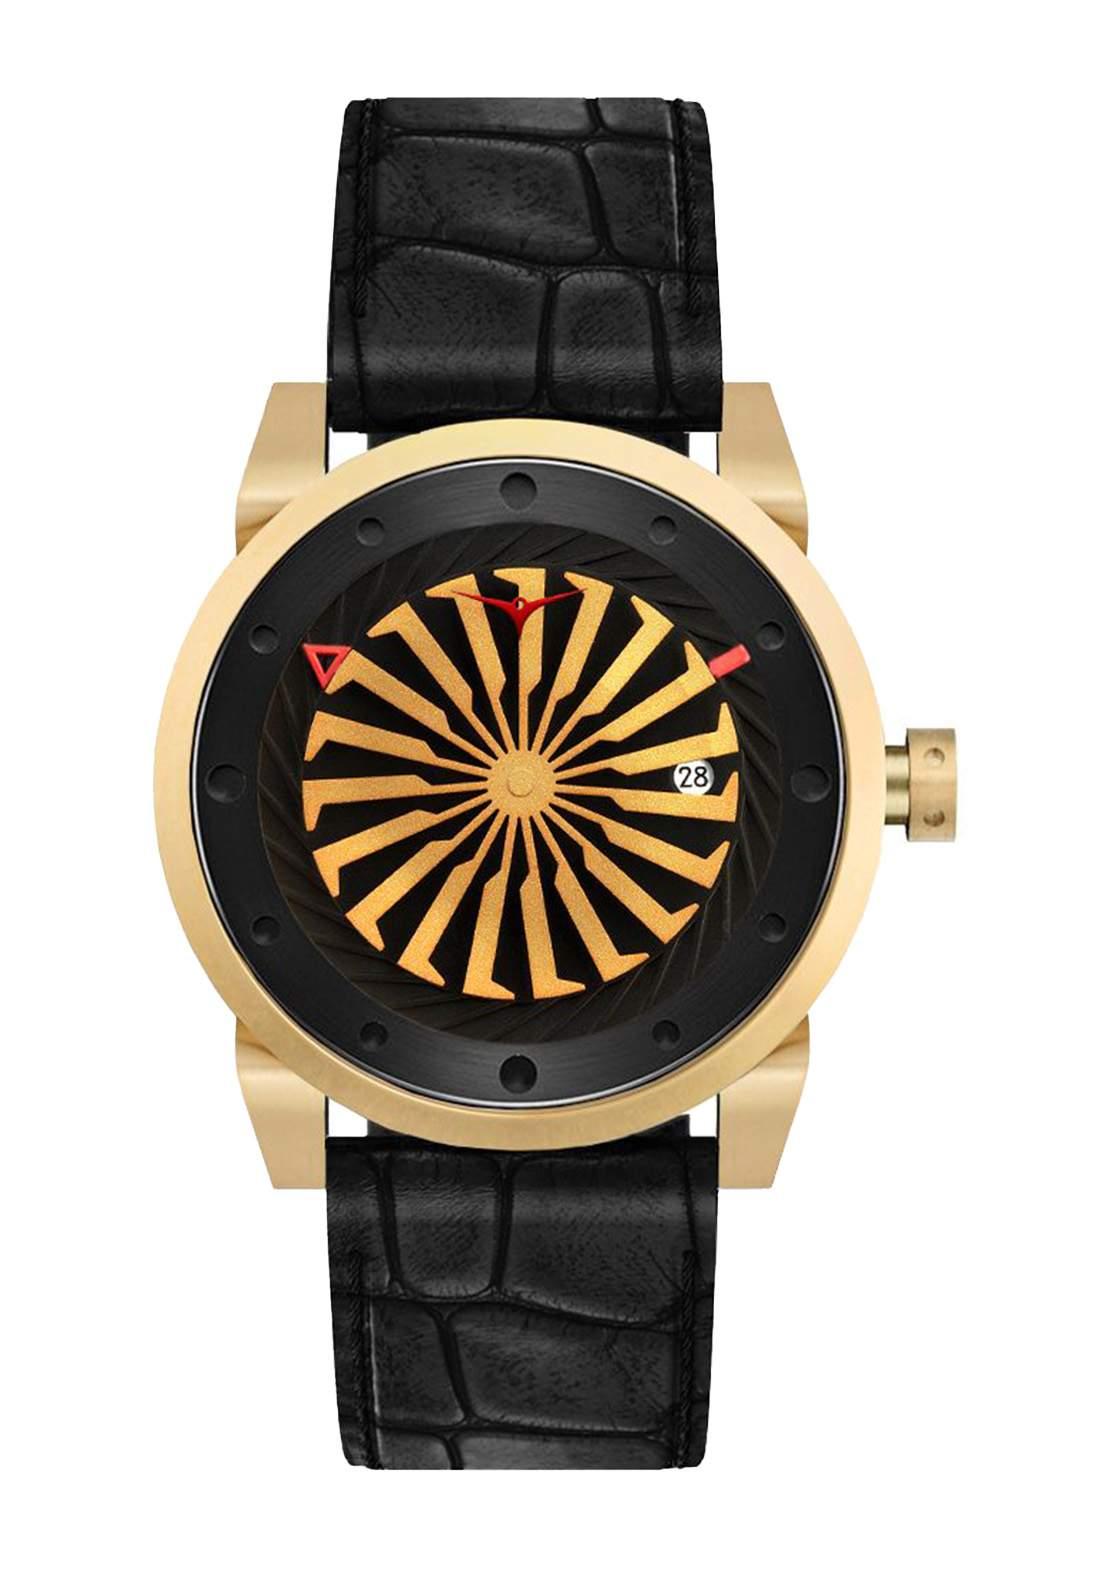 Zinvo Rival Onyx Watch For Men - Black  ساعة رجالي